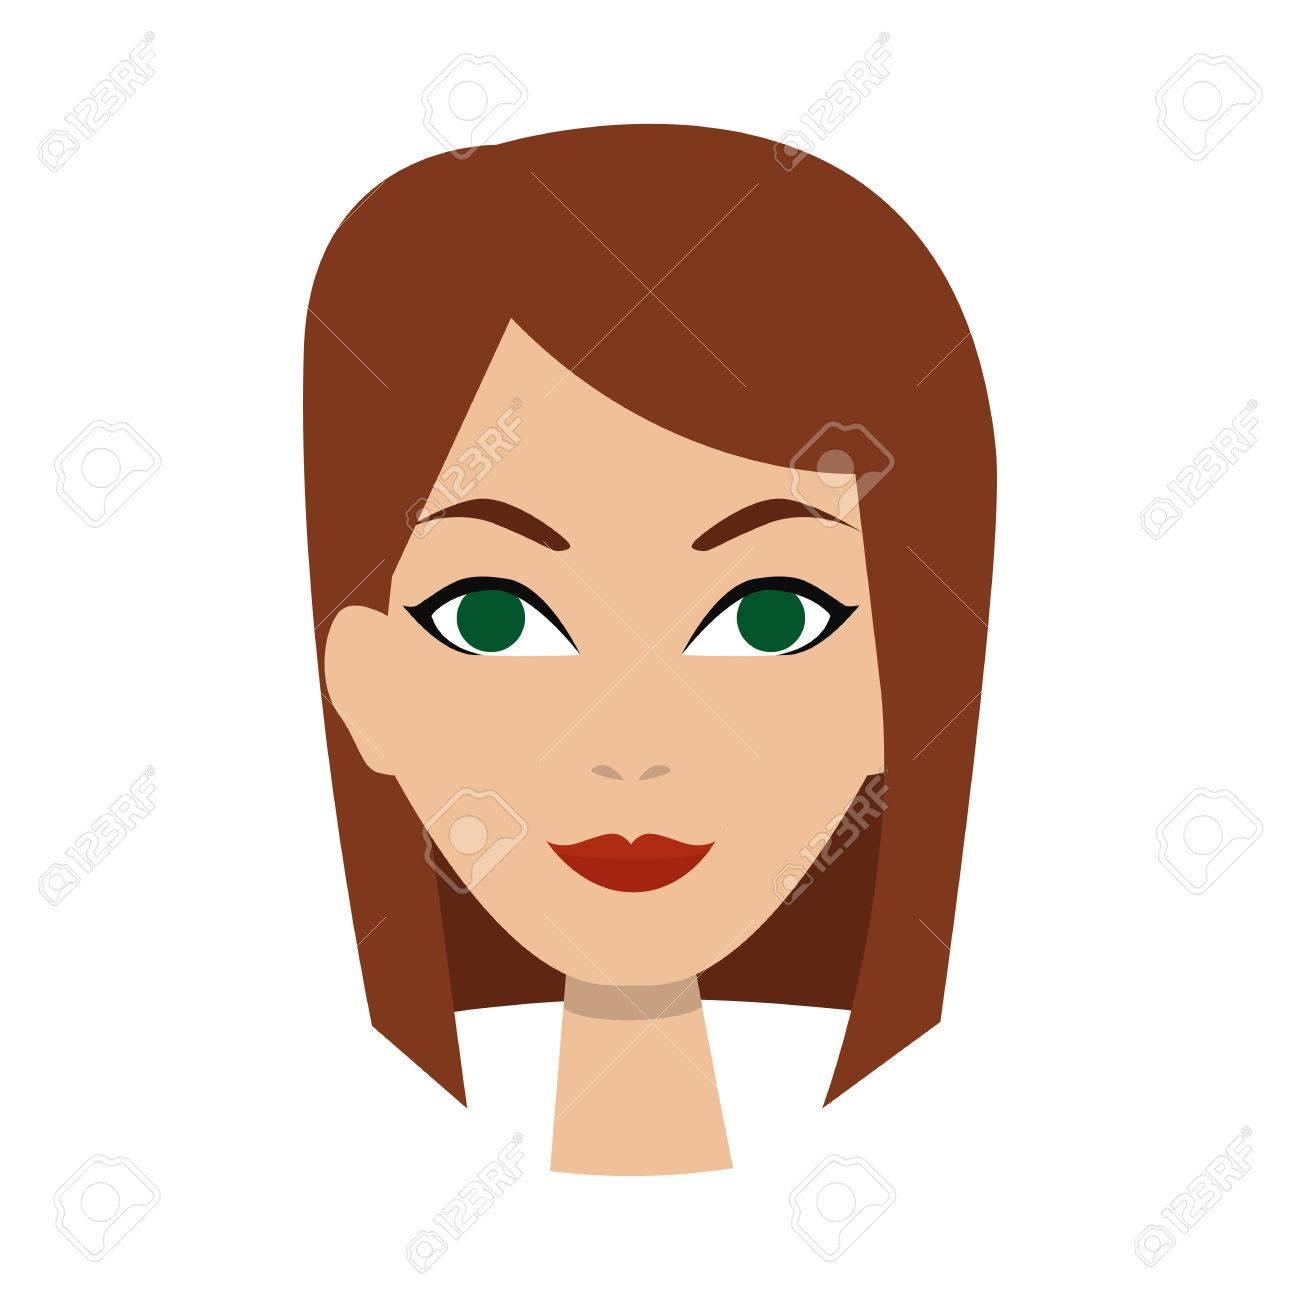 vector girl icon woman avatar face icon cartoon style stock rh 123rf com cartoon woman face outline cartoon woman face expressions